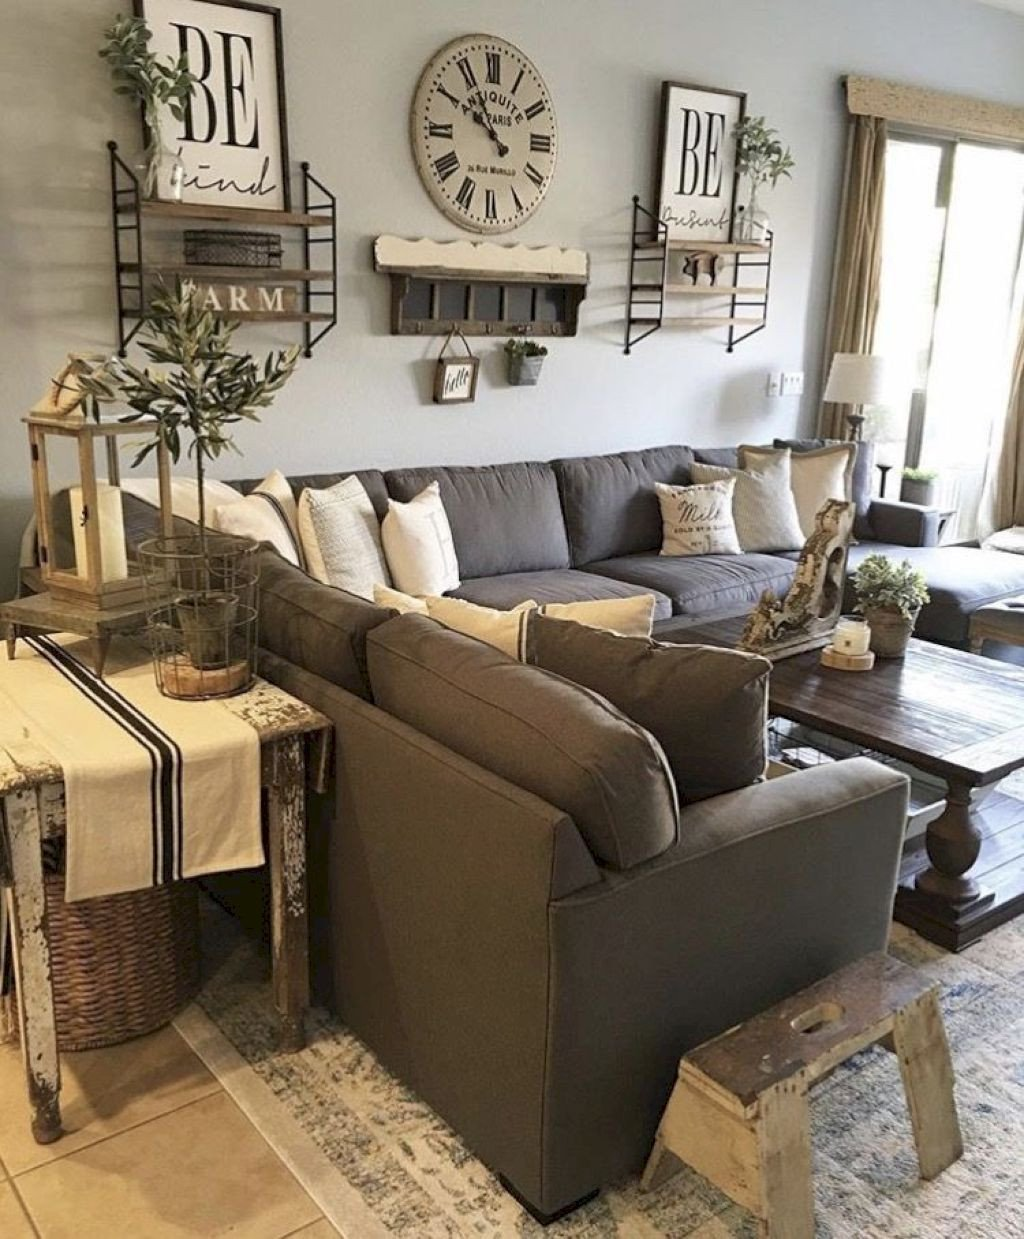 Modern Farmhouse Living Room Decor Lovely Pin by Morgan Cano On Home Decor